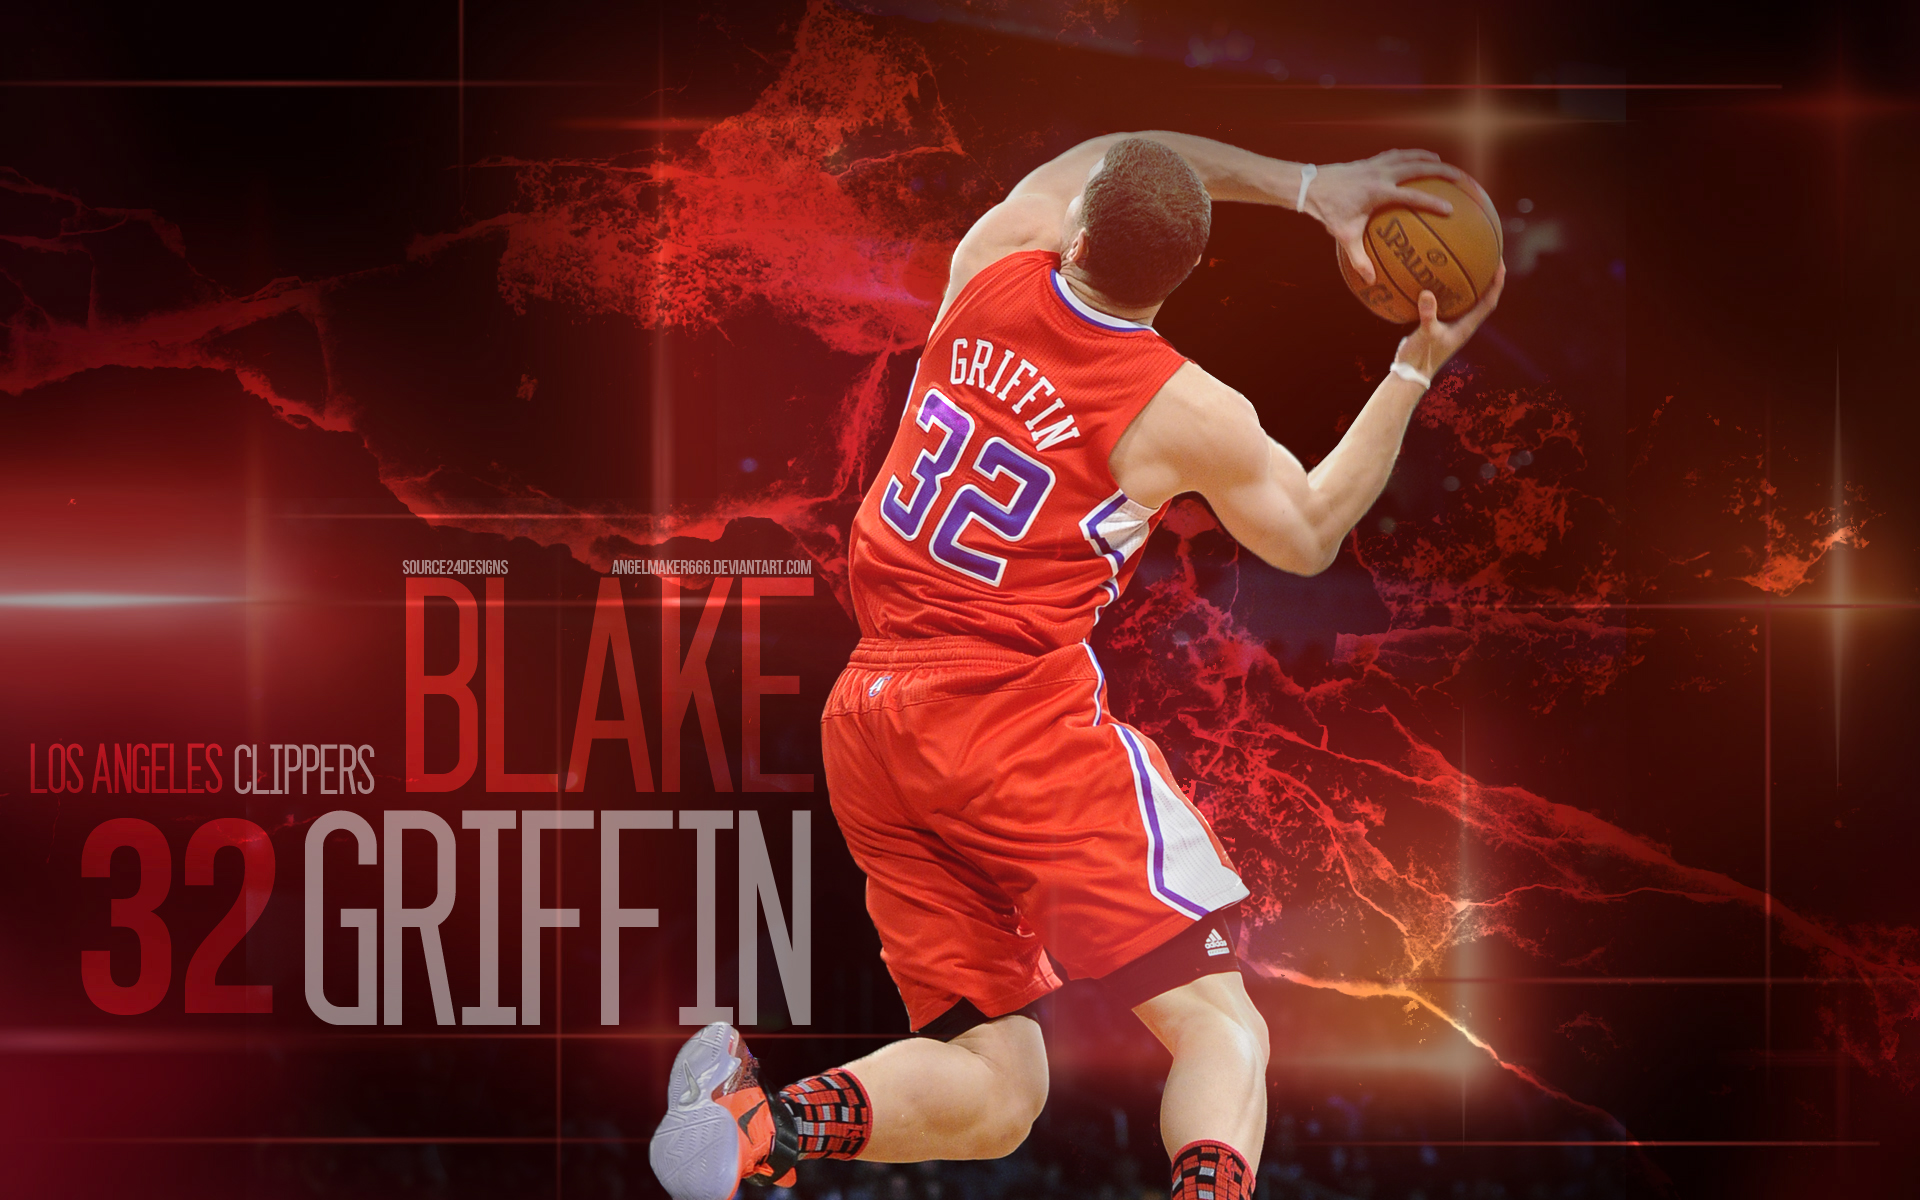 Blake Griffin wallpaper - 416580